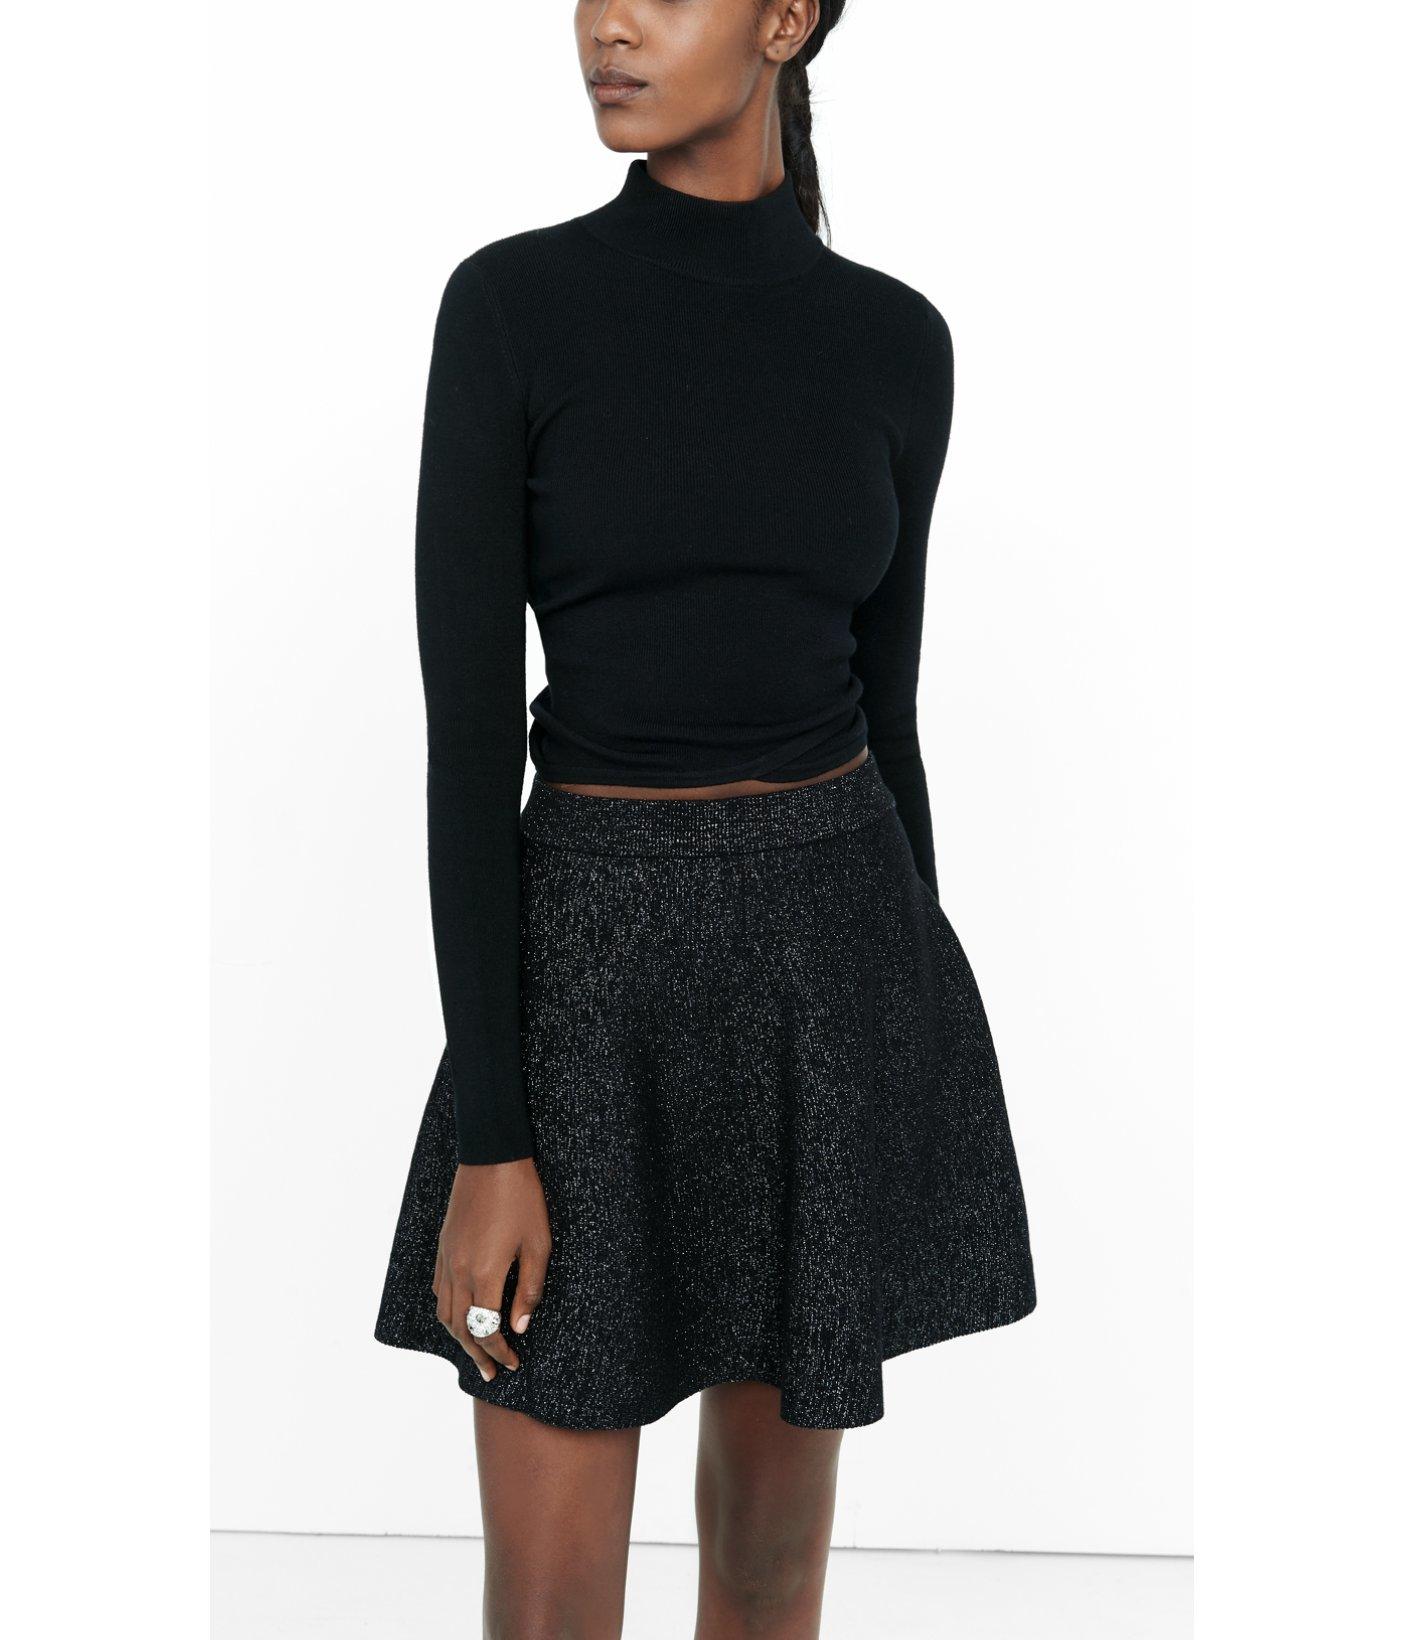 Express Metallic High Waisted Flared Mini Skirt in Black | Lyst